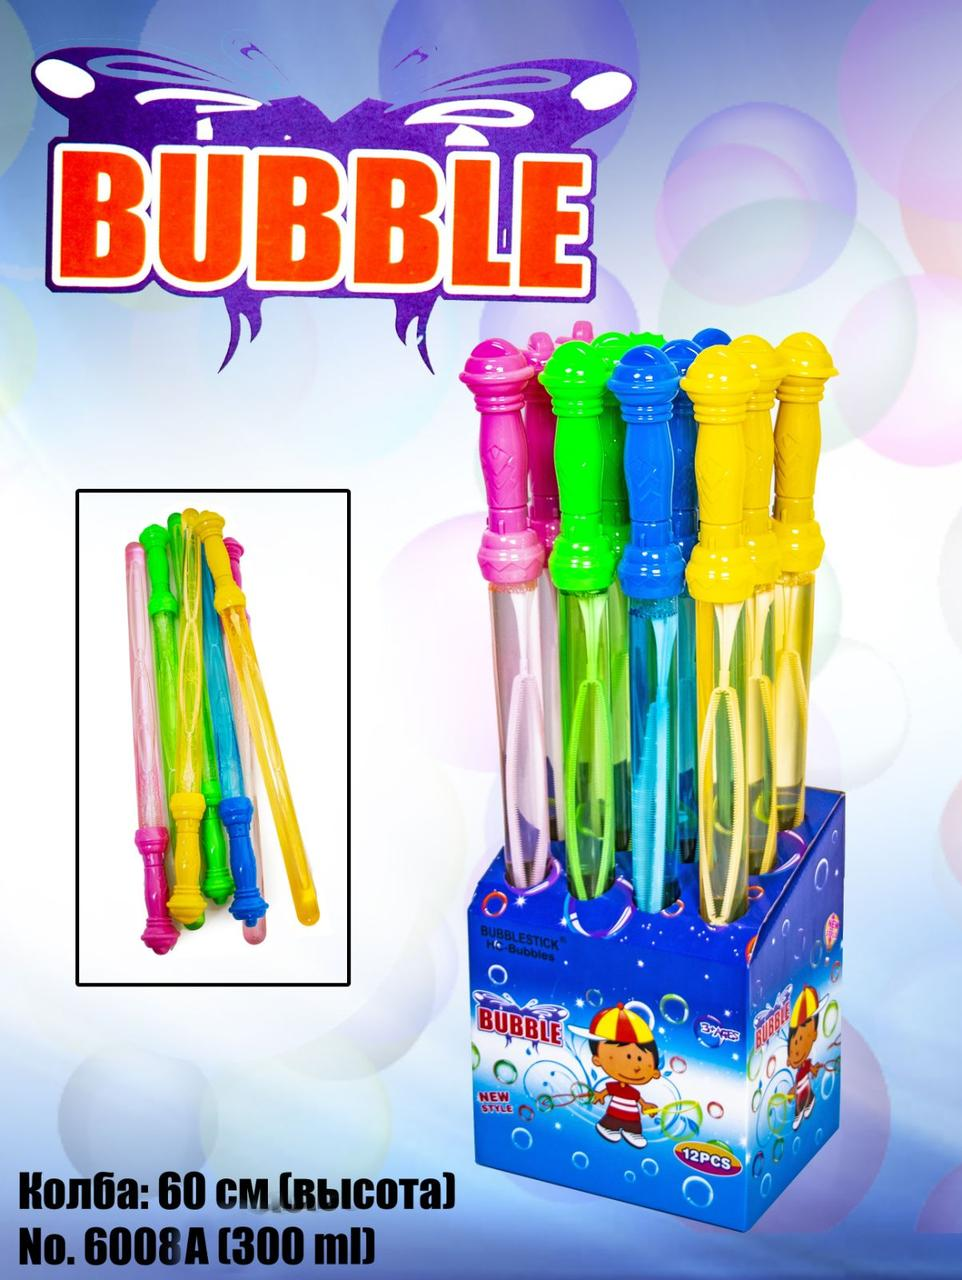 Мыльные пузыри (300 ml) 6008A